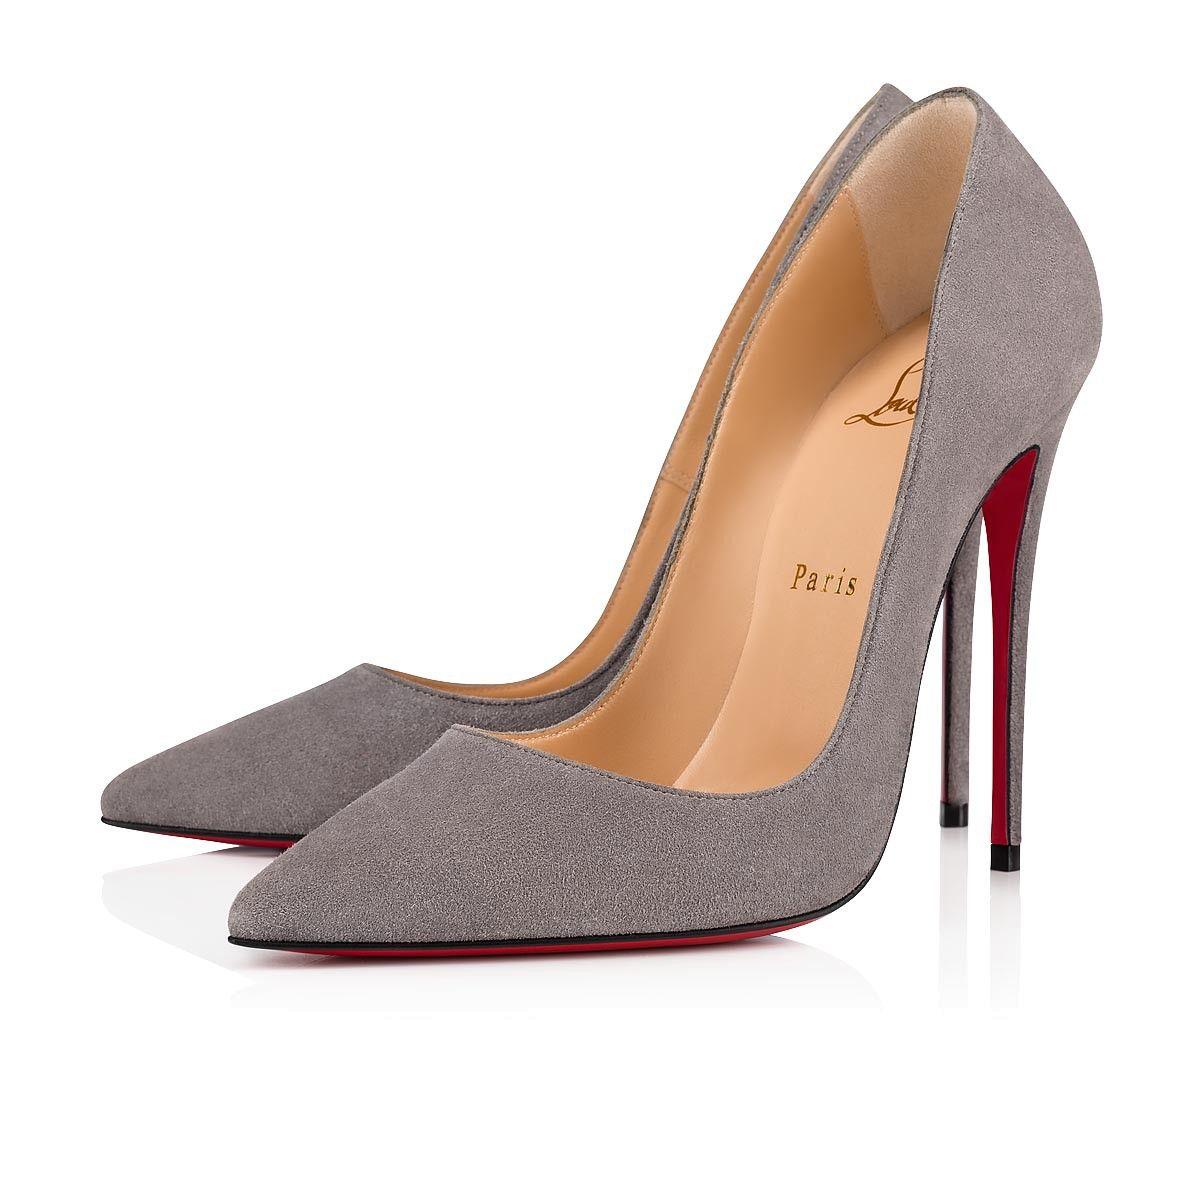 So Kate Nude Christian Louboutin Pumps Shoes : Christian